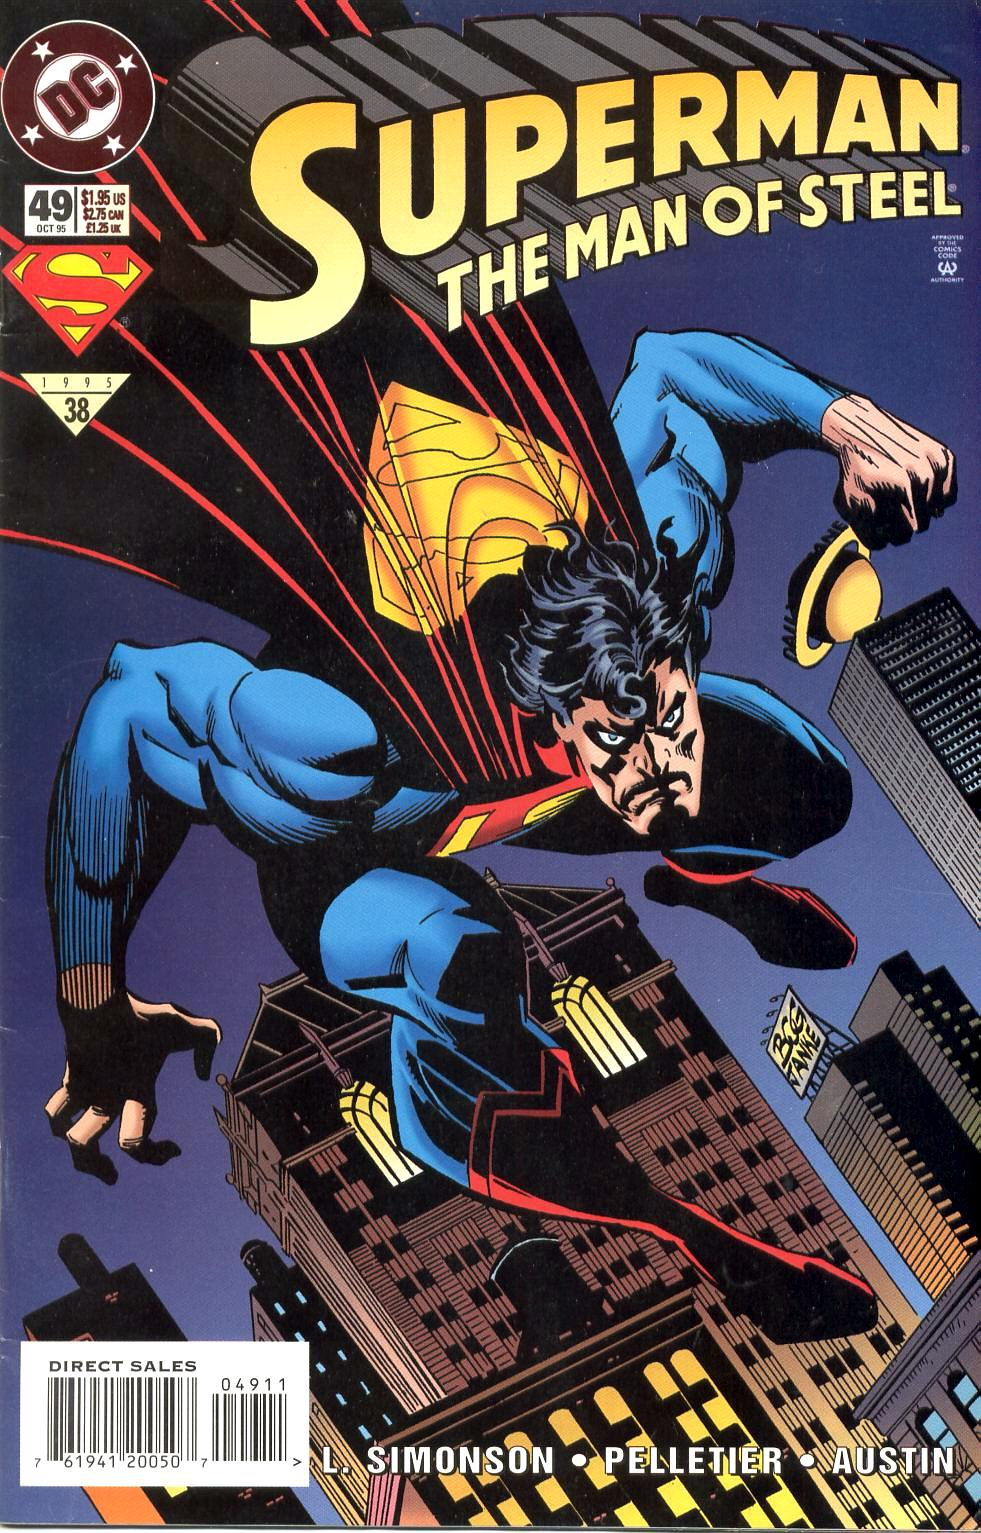 Superman: The Man of Steel Vol 1 49